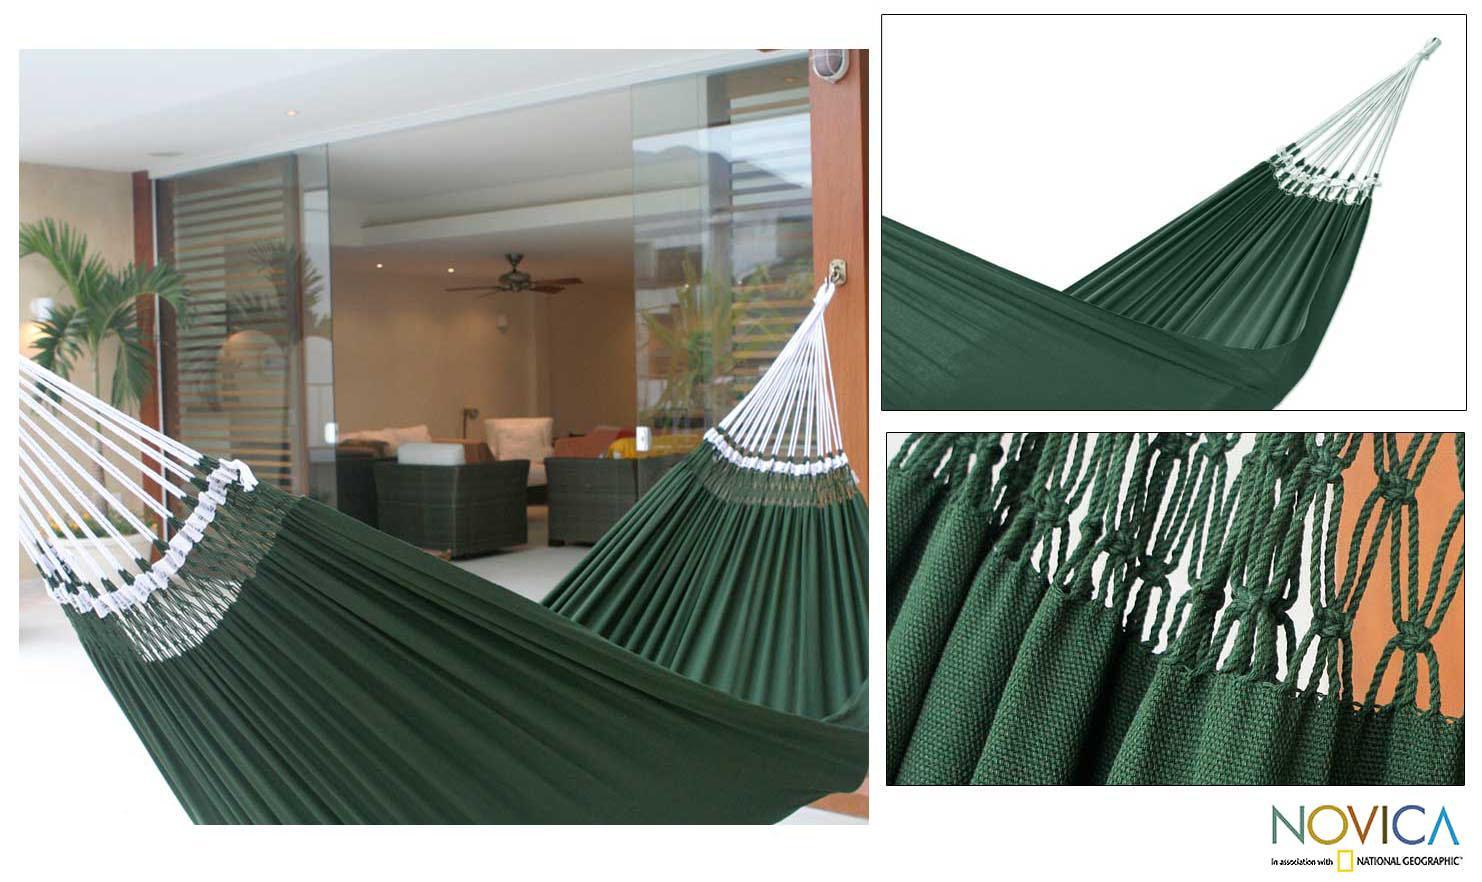 Cotton 'Ipanema Palm' Hammock (Brazil)